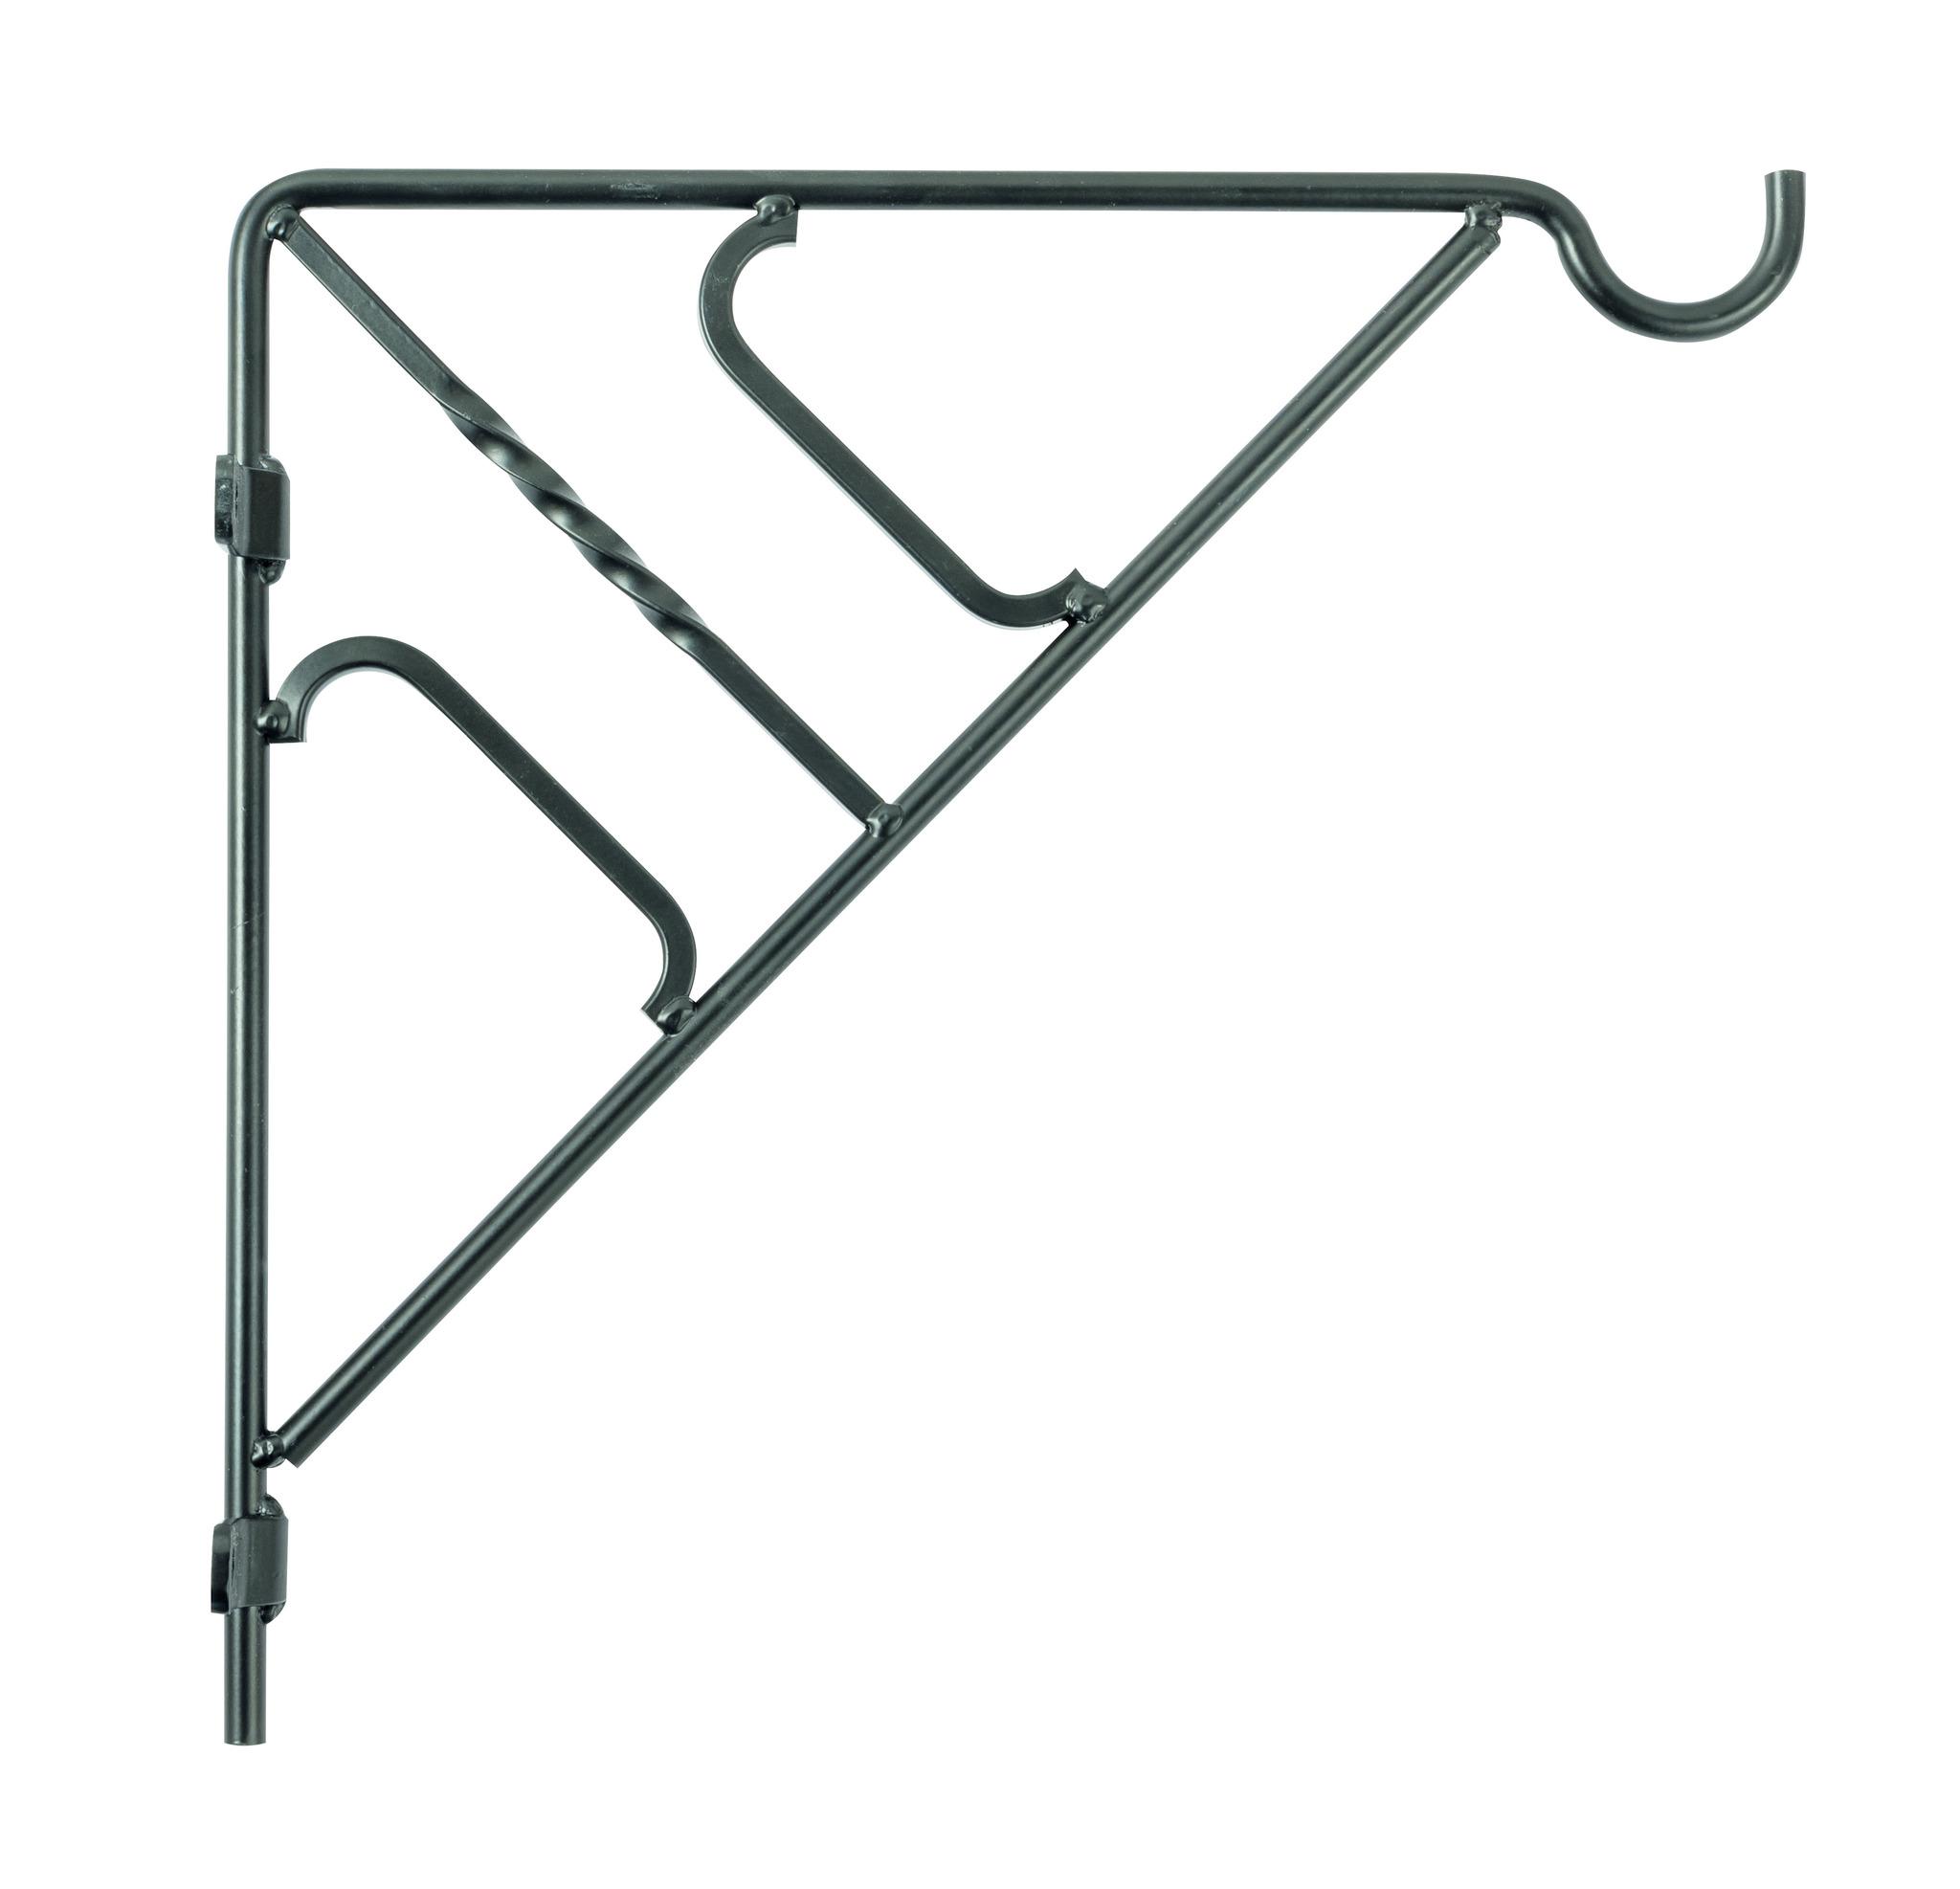 Gardman Stainless Steel Brackets For Hanging Baskets